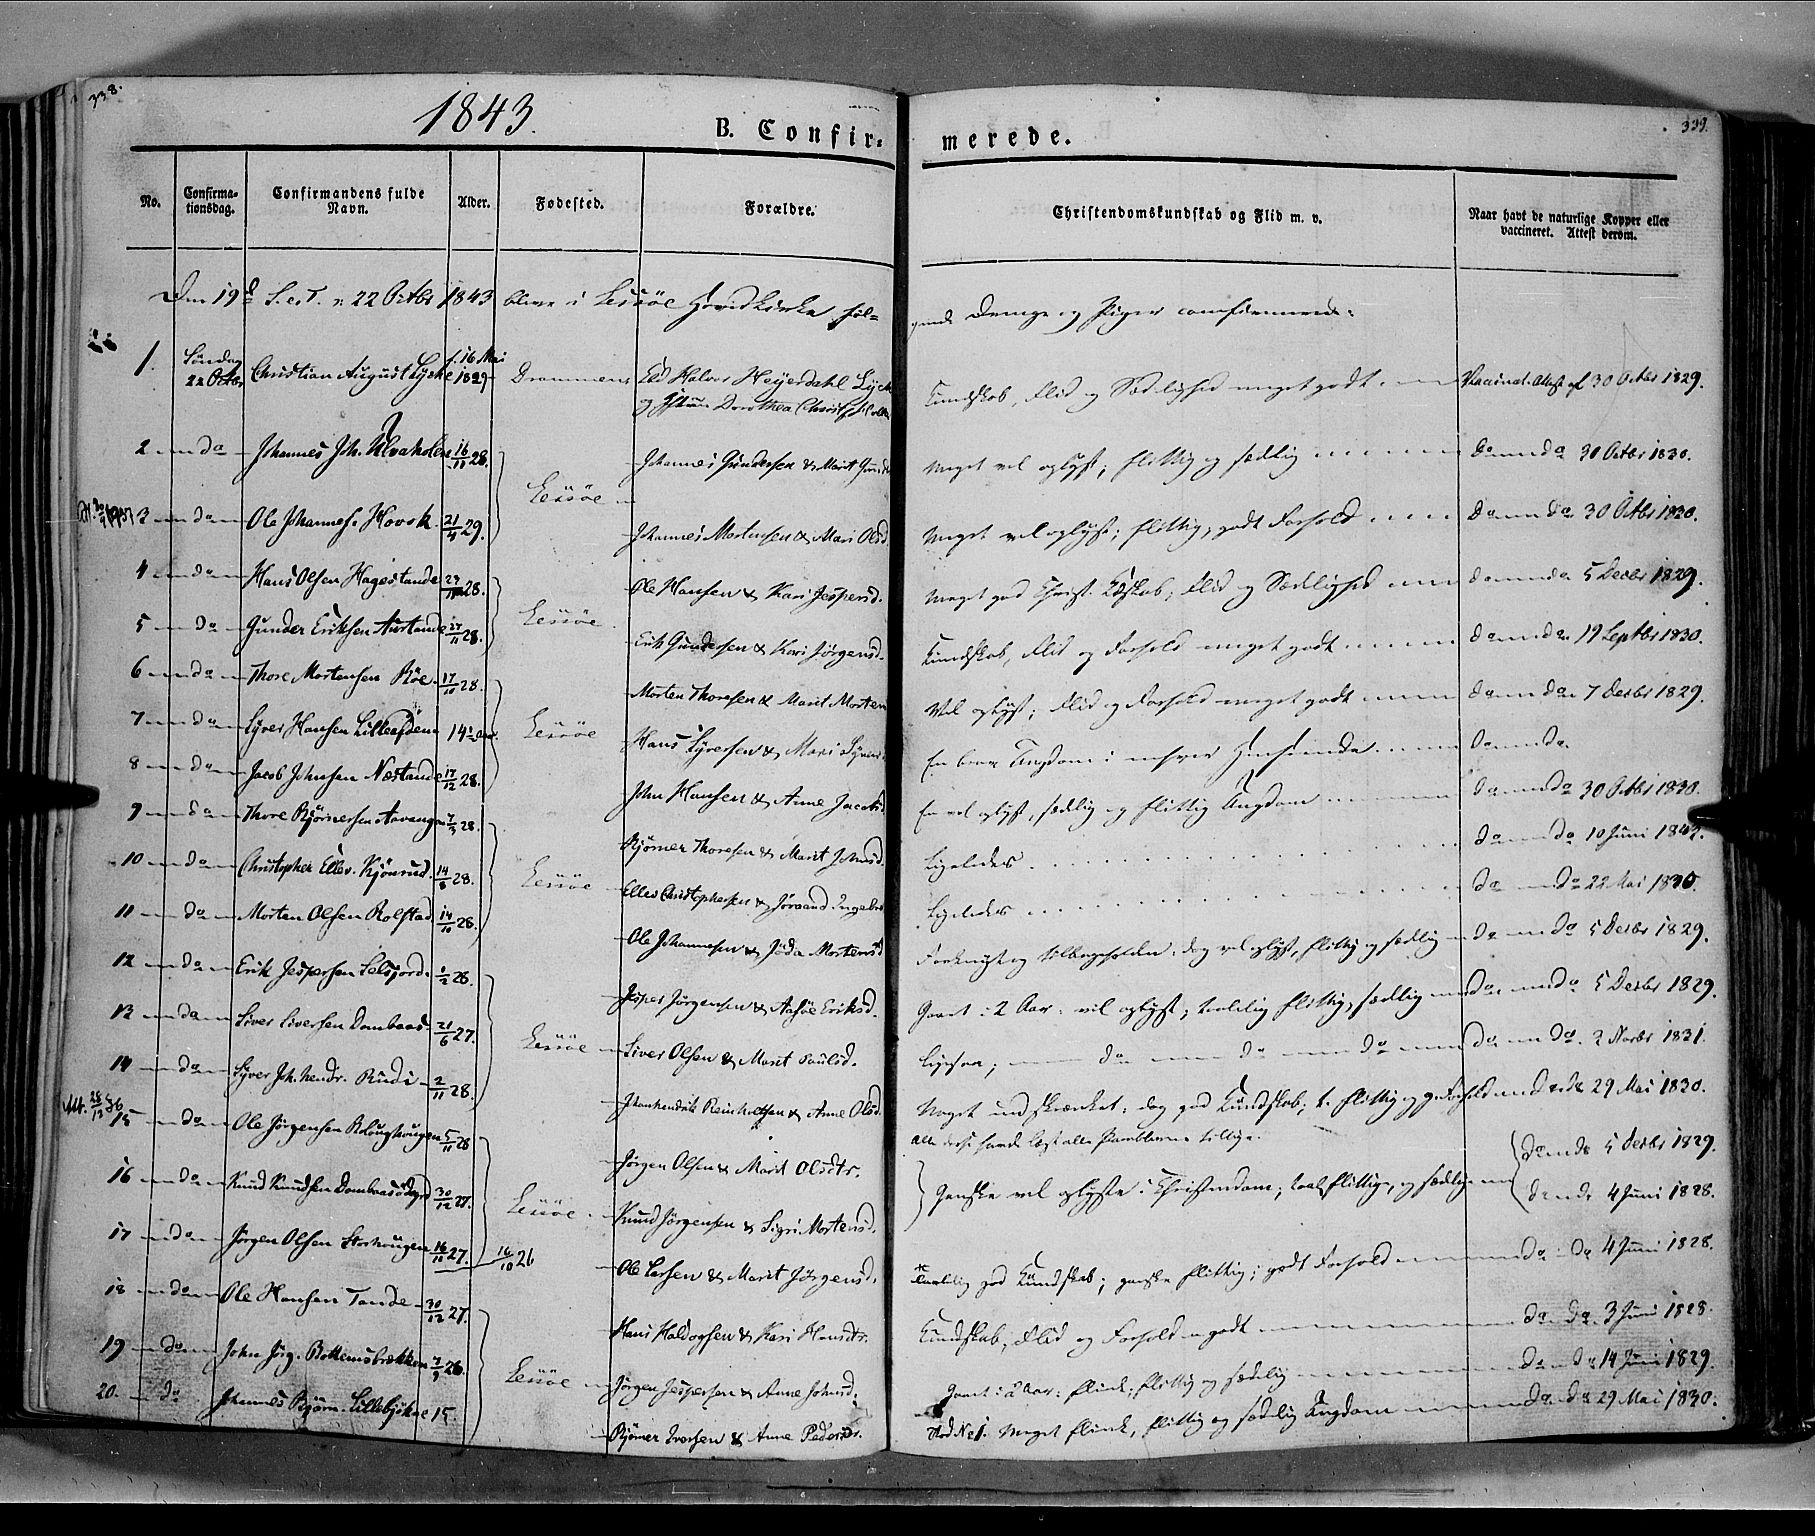 SAH, Lesja prestekontor, Ministerialbok nr. 6A, 1843-1854, s. 338-339